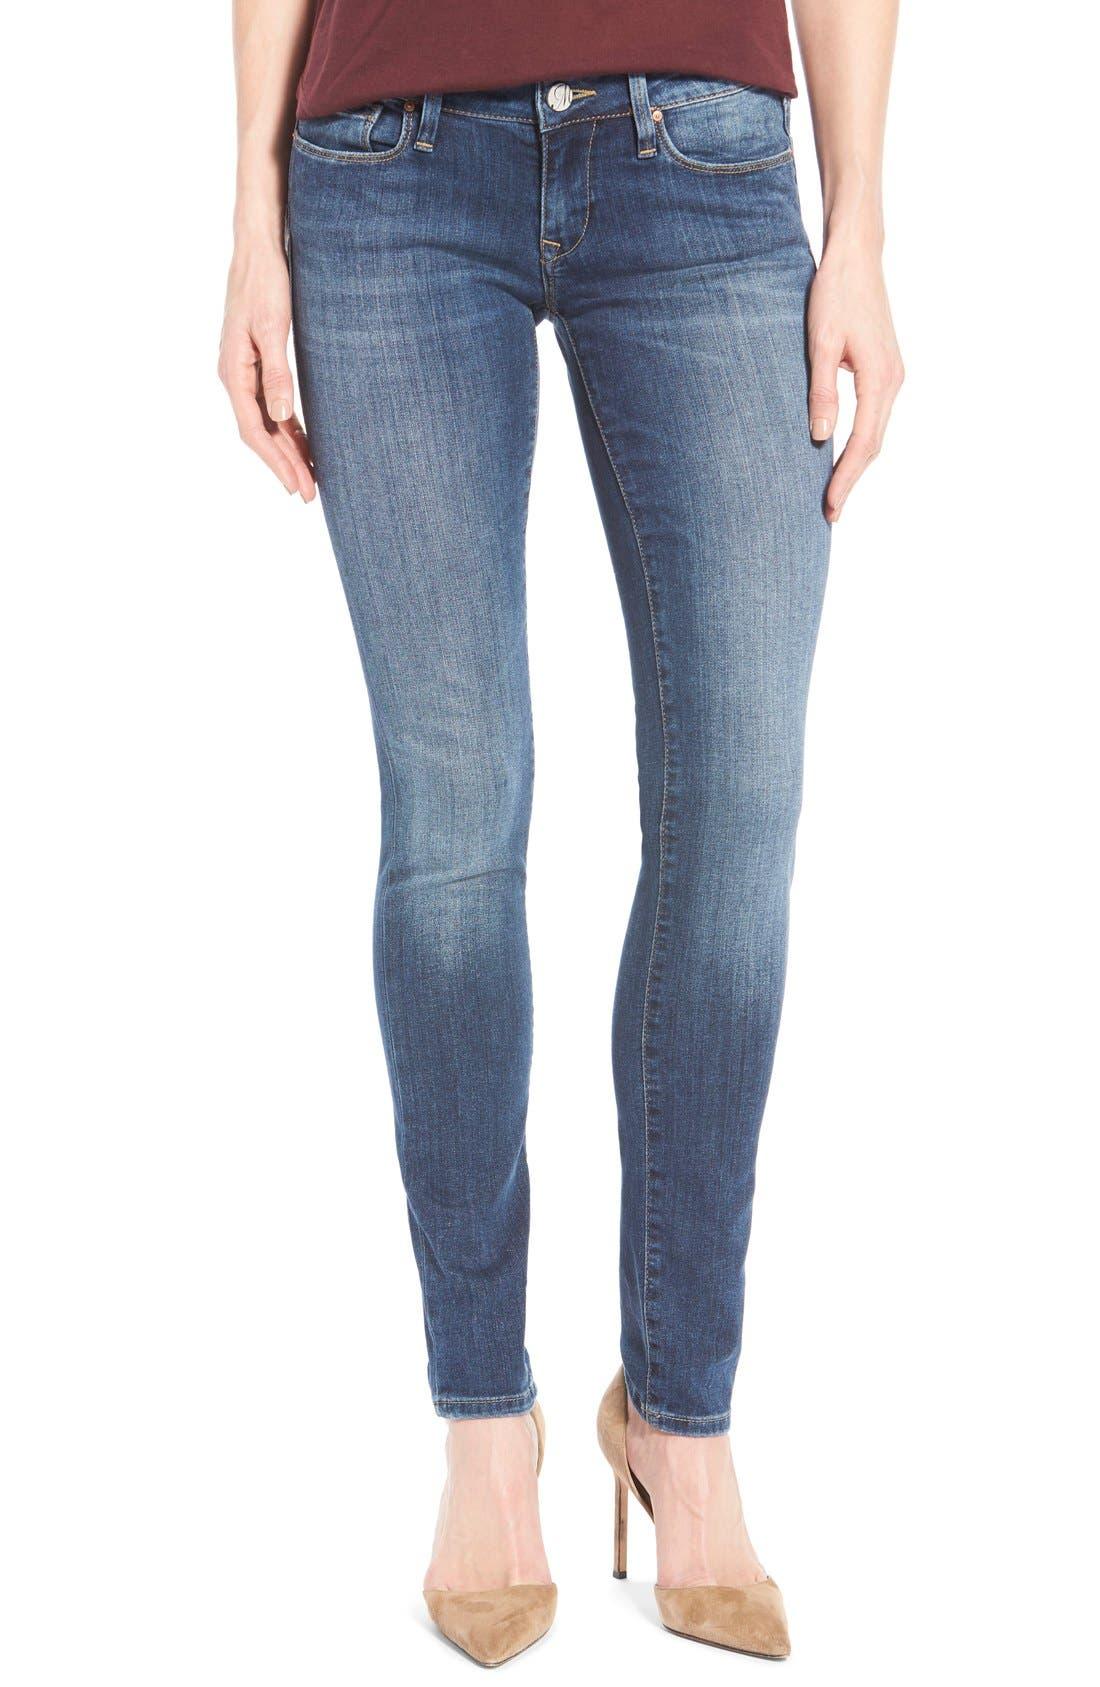 Main Image - Mavi Jeans 'Serena' Stretch Low Rise Skinny Jeans (Indigo Nolita)